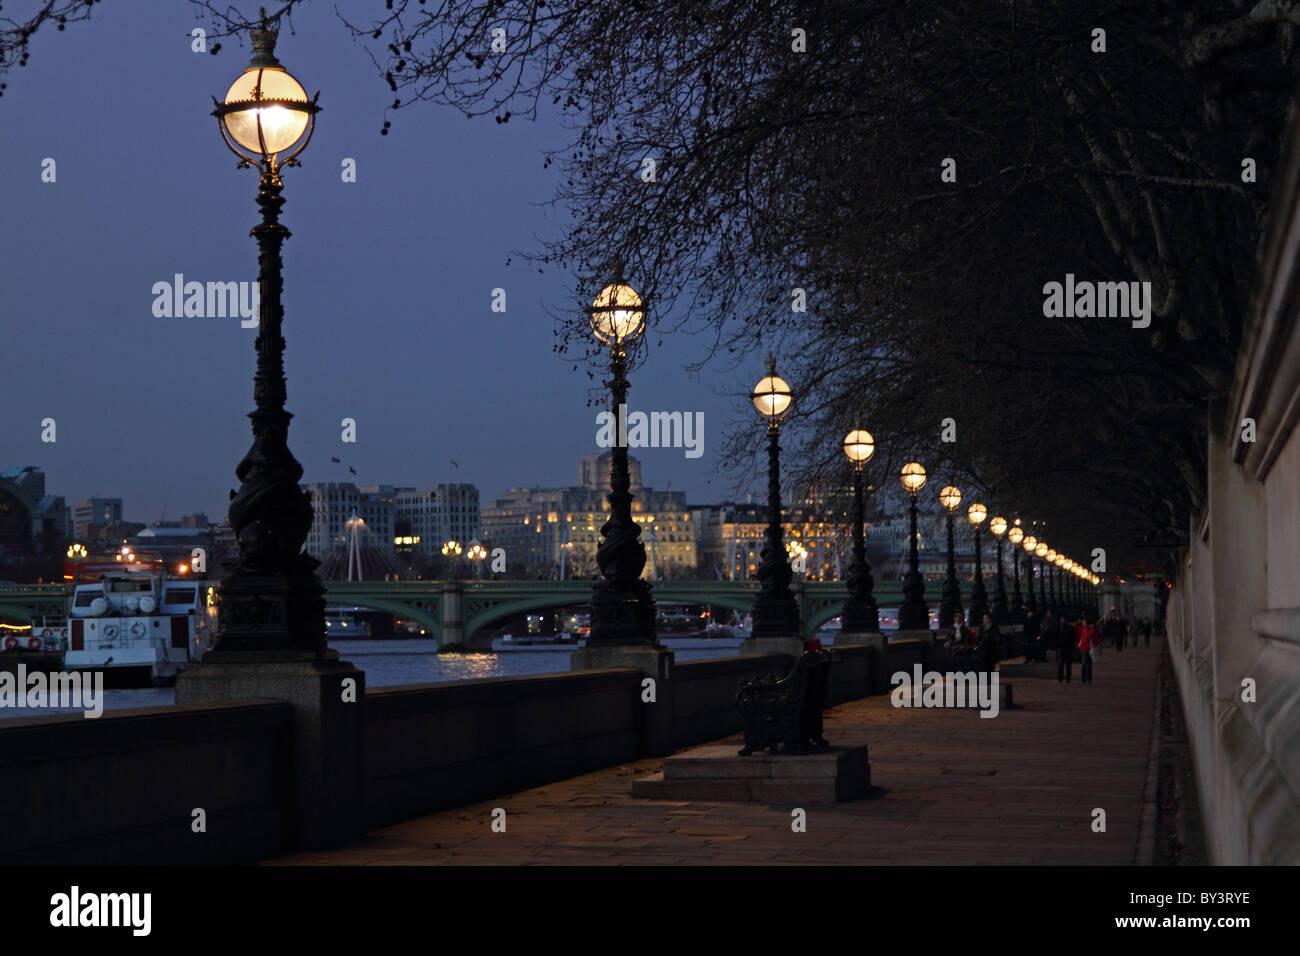 Banco del Sur por luz Thames Embankment Londres ruta paseo nocturno Imagen De Stock